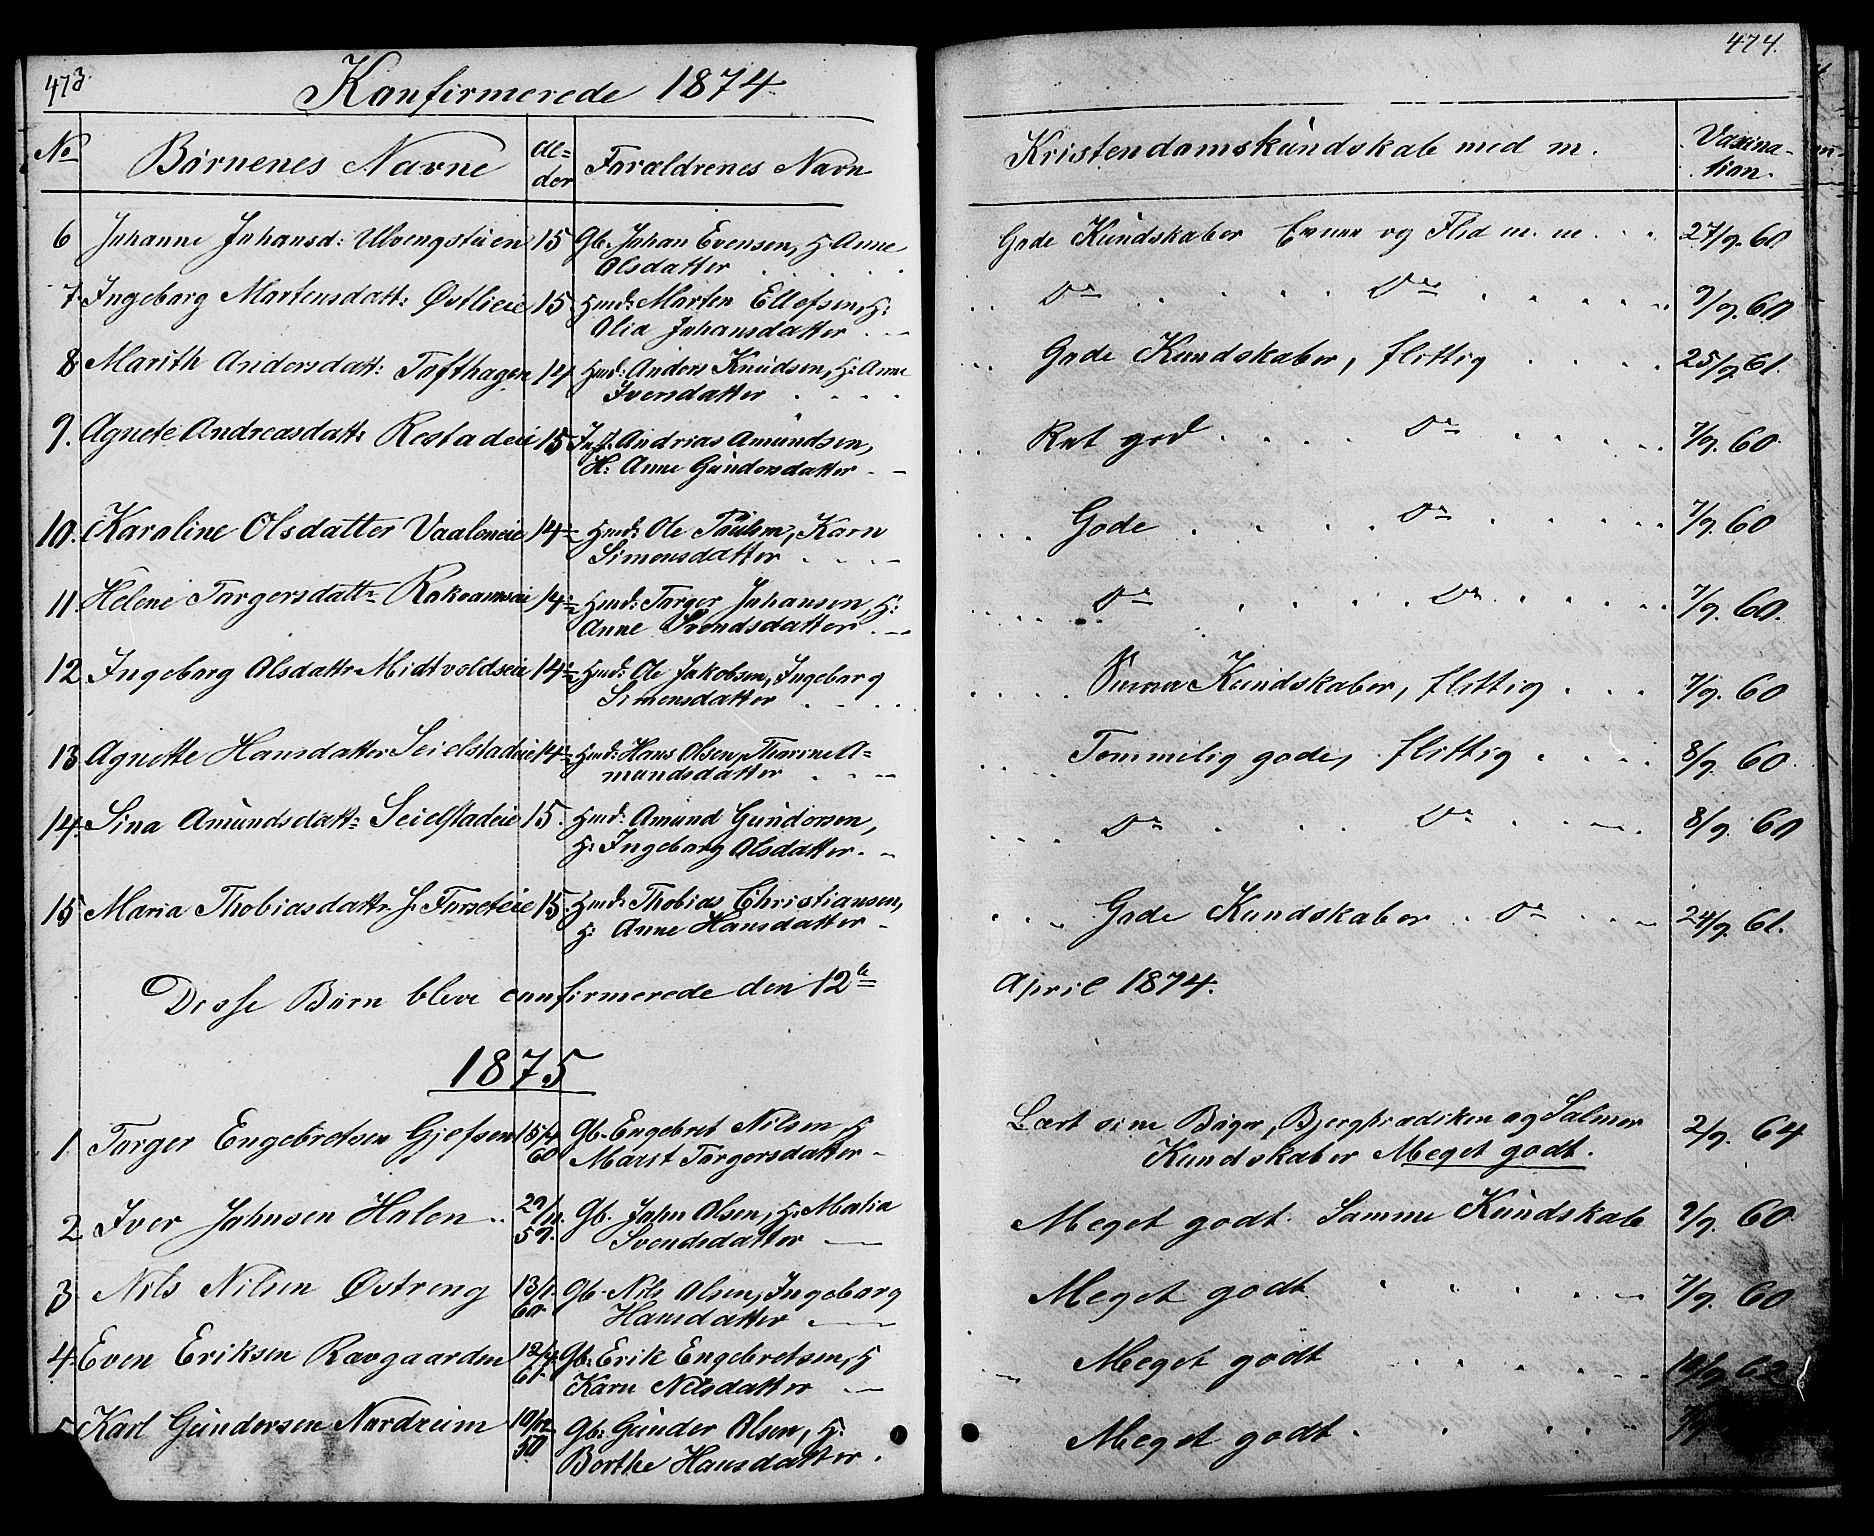 SAH, Østre Gausdal prestekontor, Klokkerbok nr. 1, 1863-1893, s. 473-474